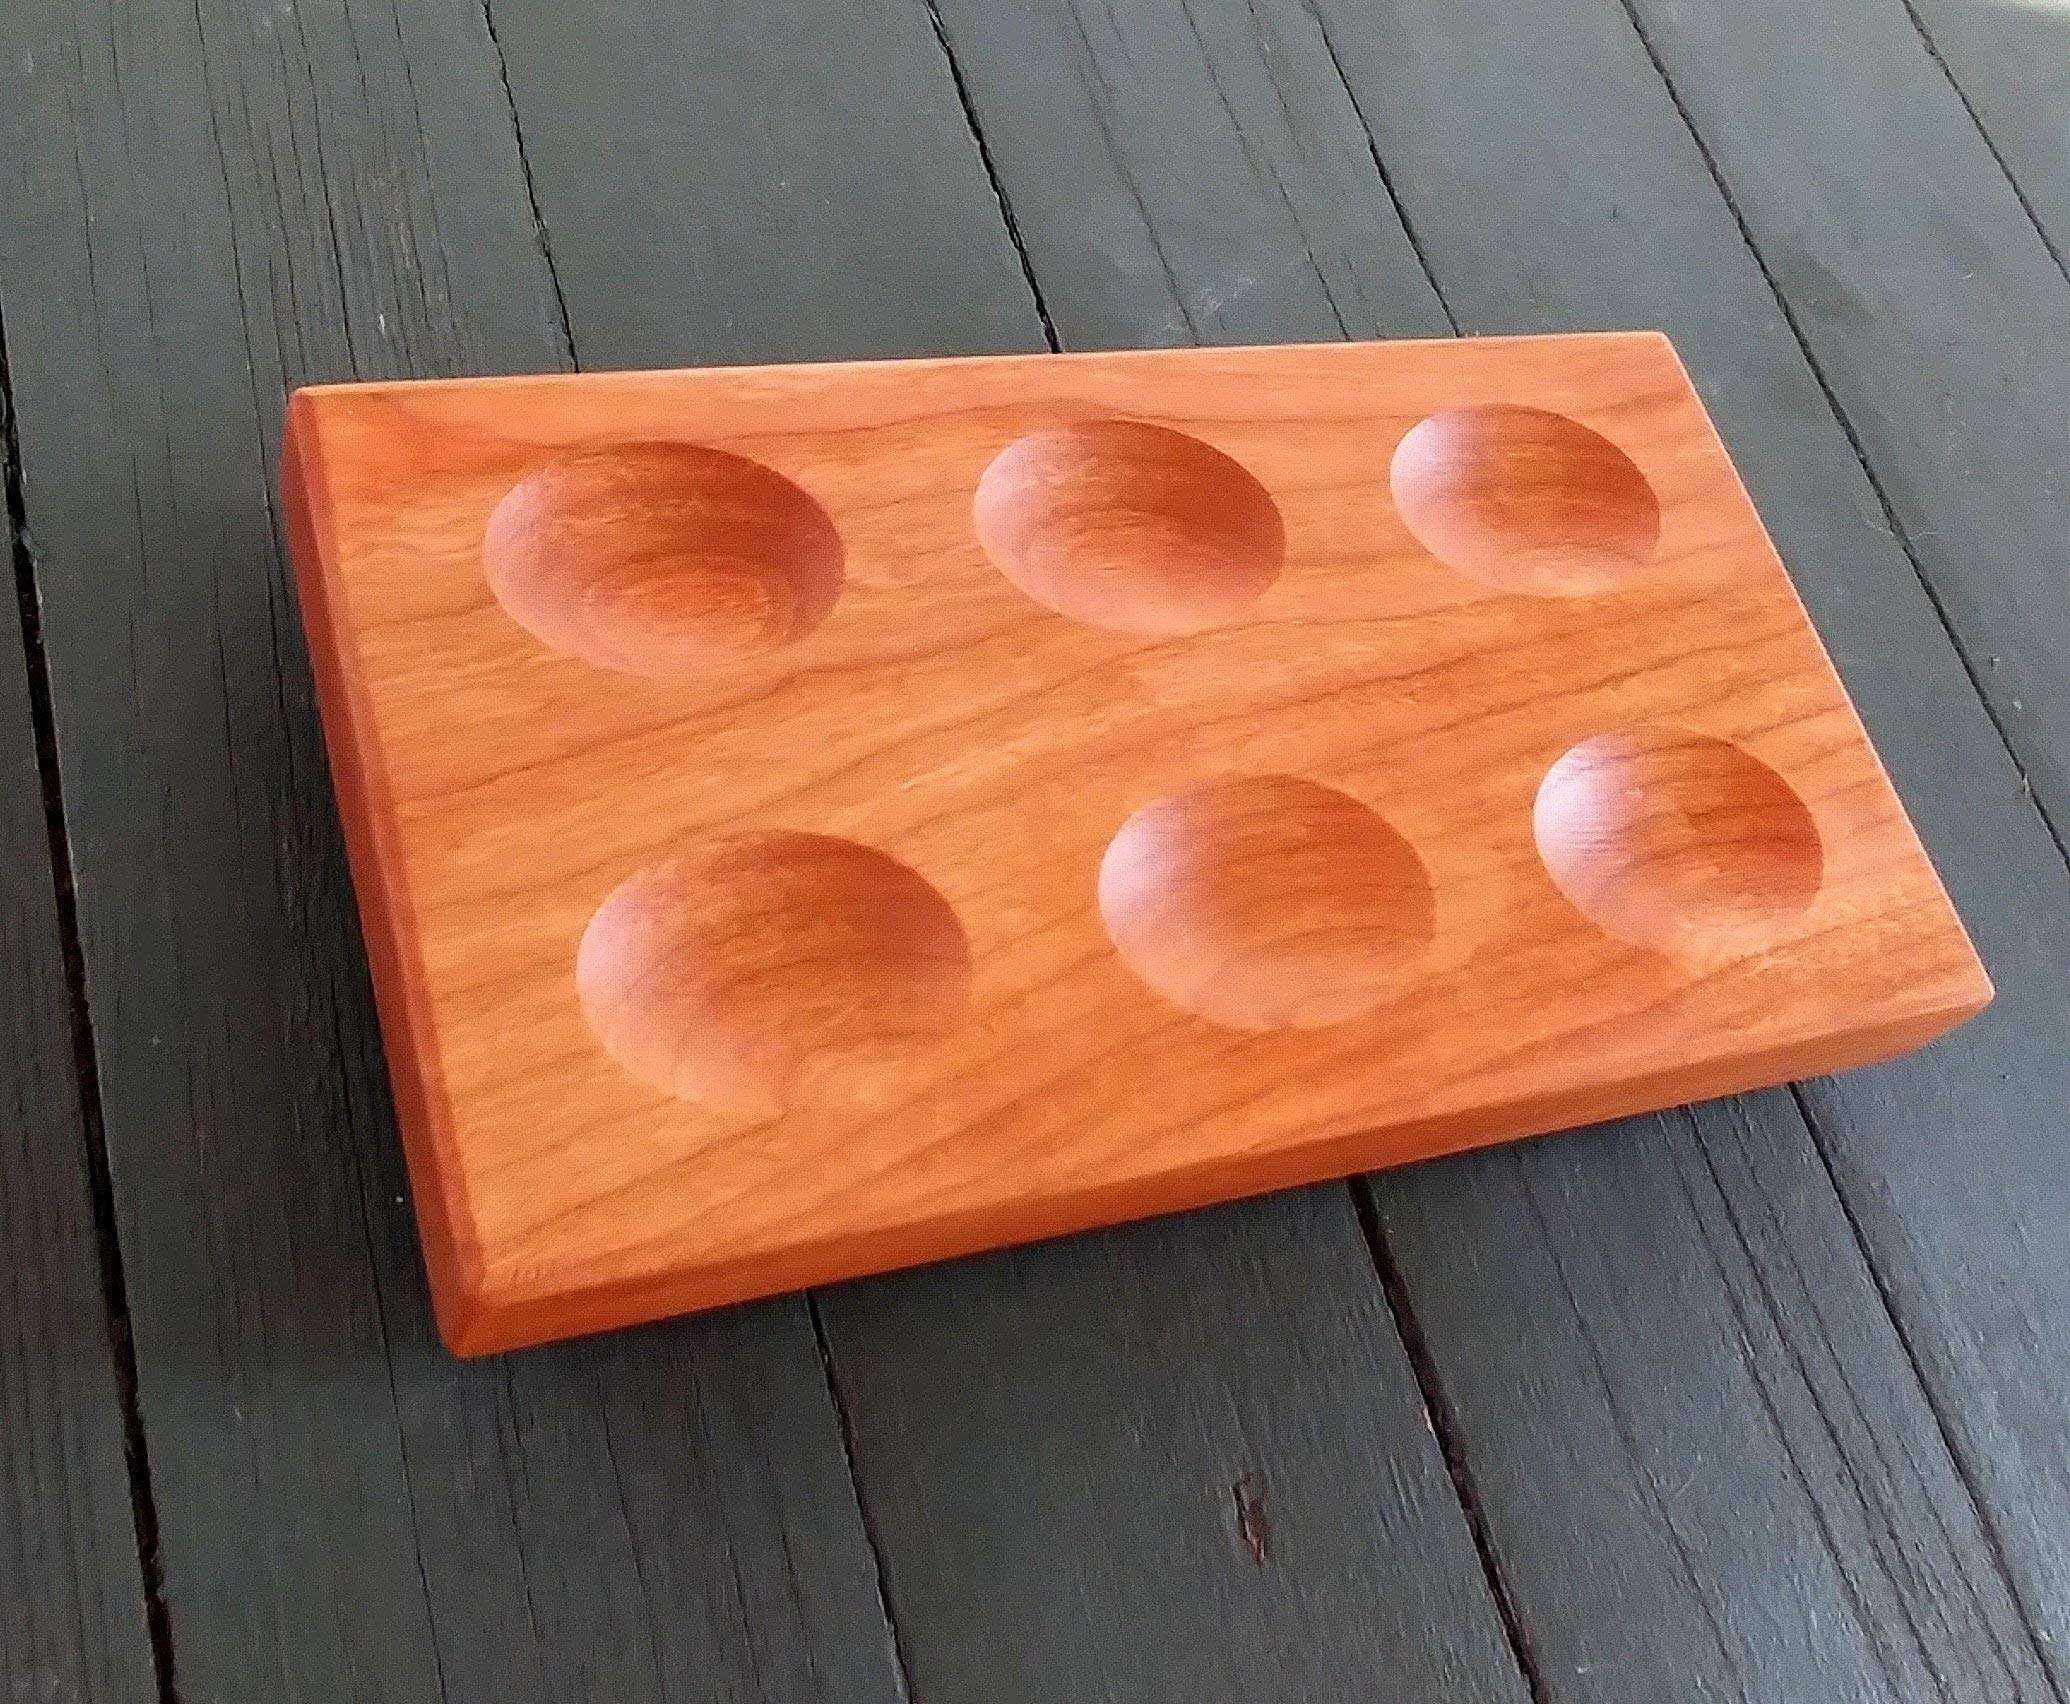 Half Dozen Wood Deviled Egg Tray, Egg Platter, Deviled Egg Holder, Wooden Egg Rack, Deviled Egg Serving Tray, Wooden Egg Tray